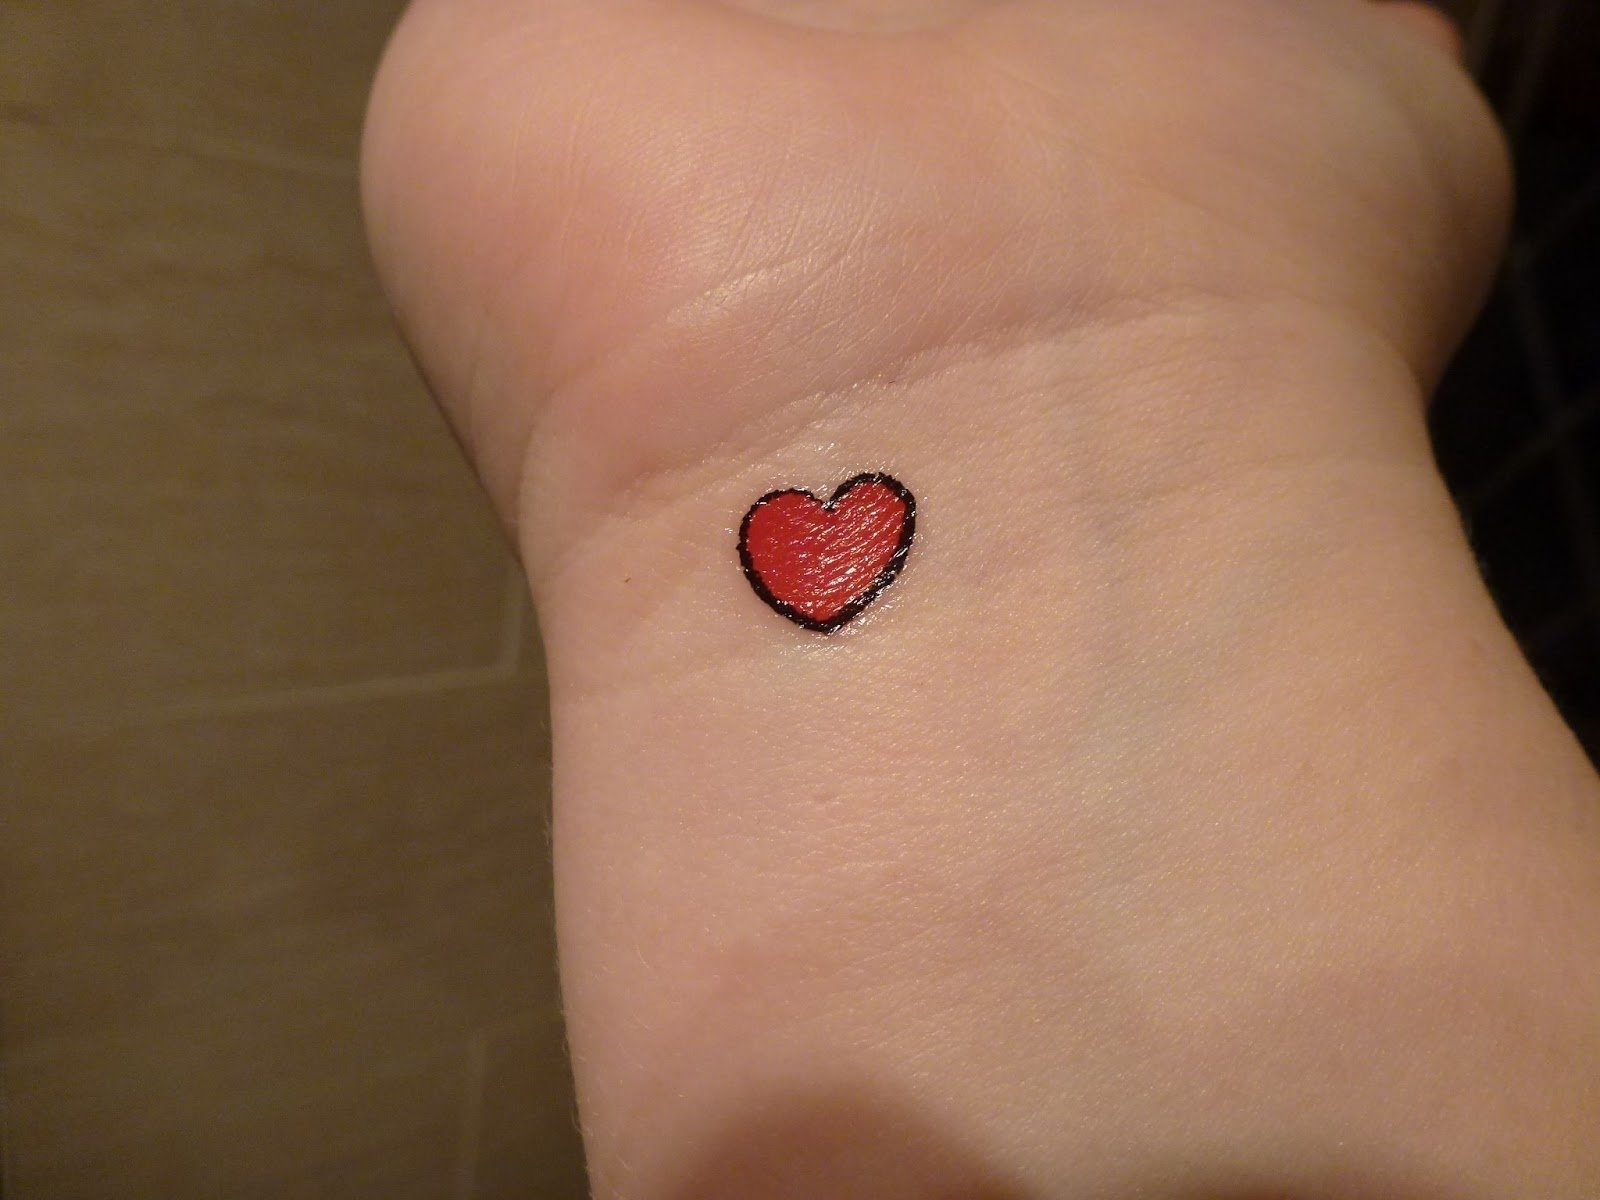 10 Stylish Heart Tattoo Cover Up Ideas tiny red heart tattoo on wrist 2020